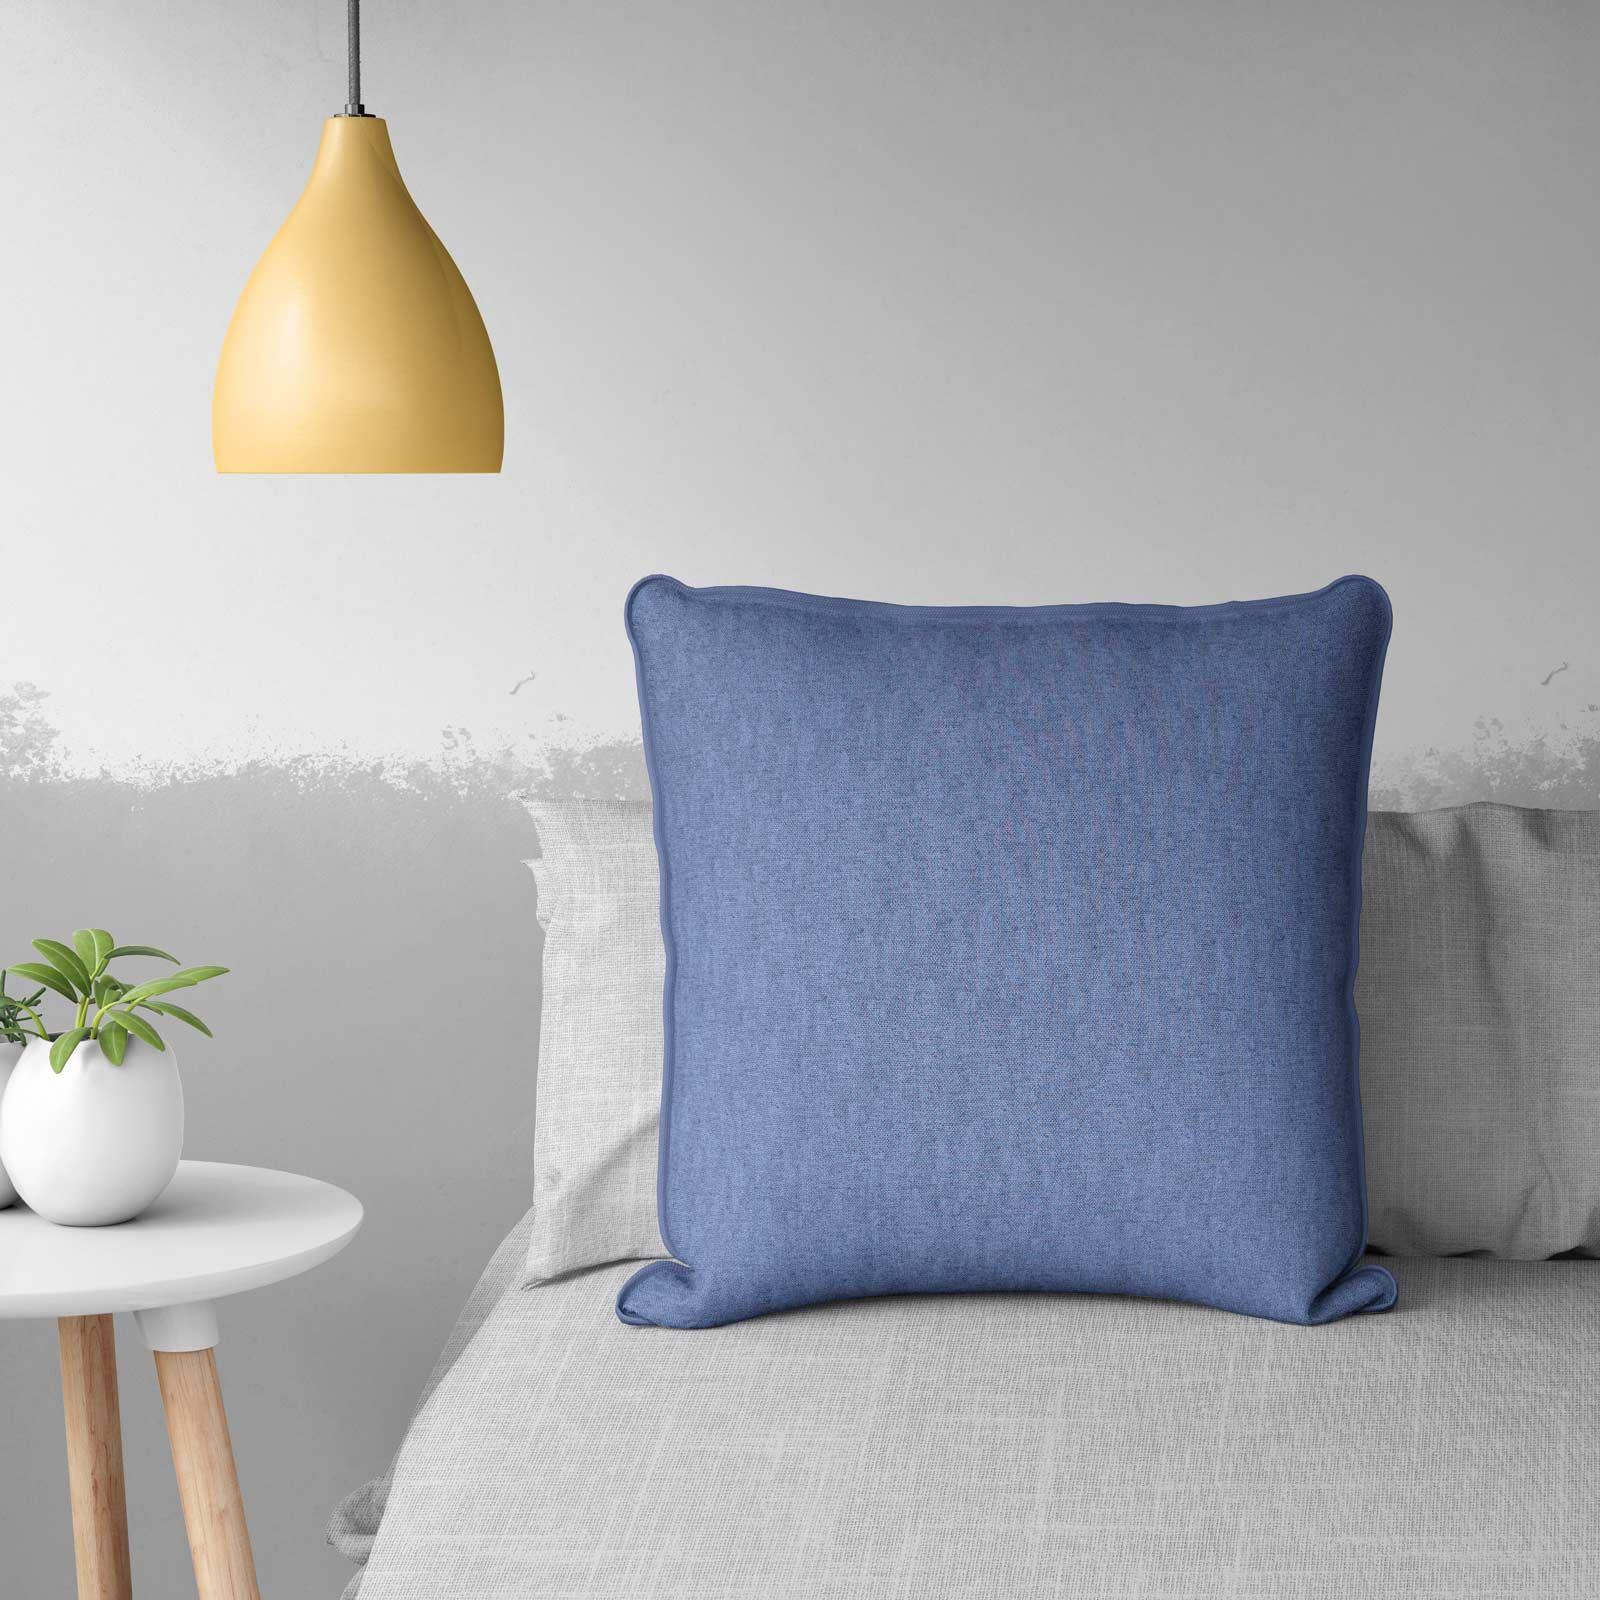 Crema-Color-Foglia-Di-Te-Blu-Uovo-D-039-anatra-Cuscino-Copre-18-034-x-18-034-45-CM-x-45-cm-COVER miniatura 51